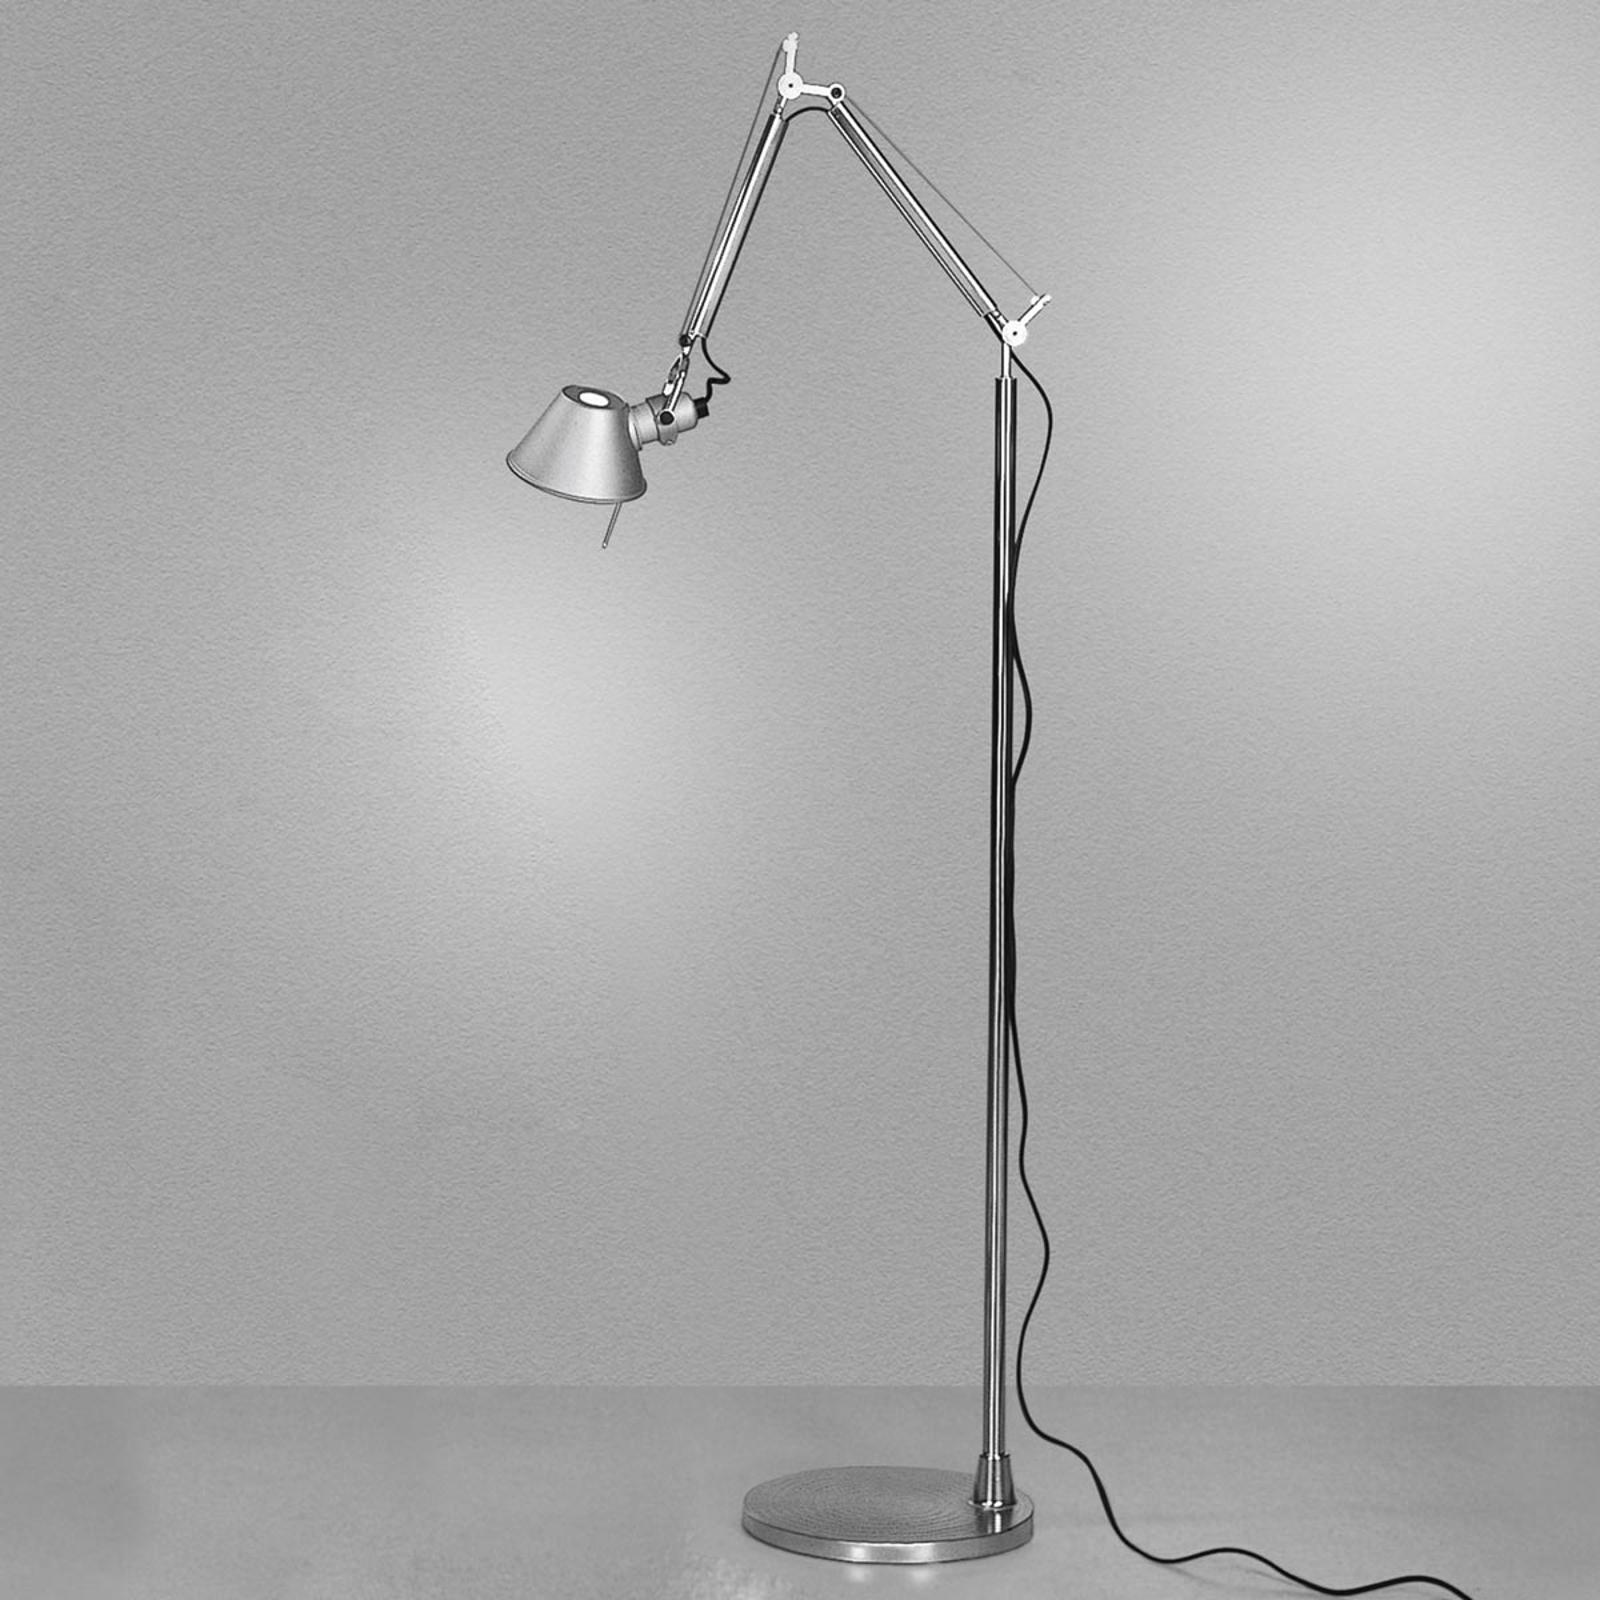 Lampadaire de designer épuré Tolomeo Micro